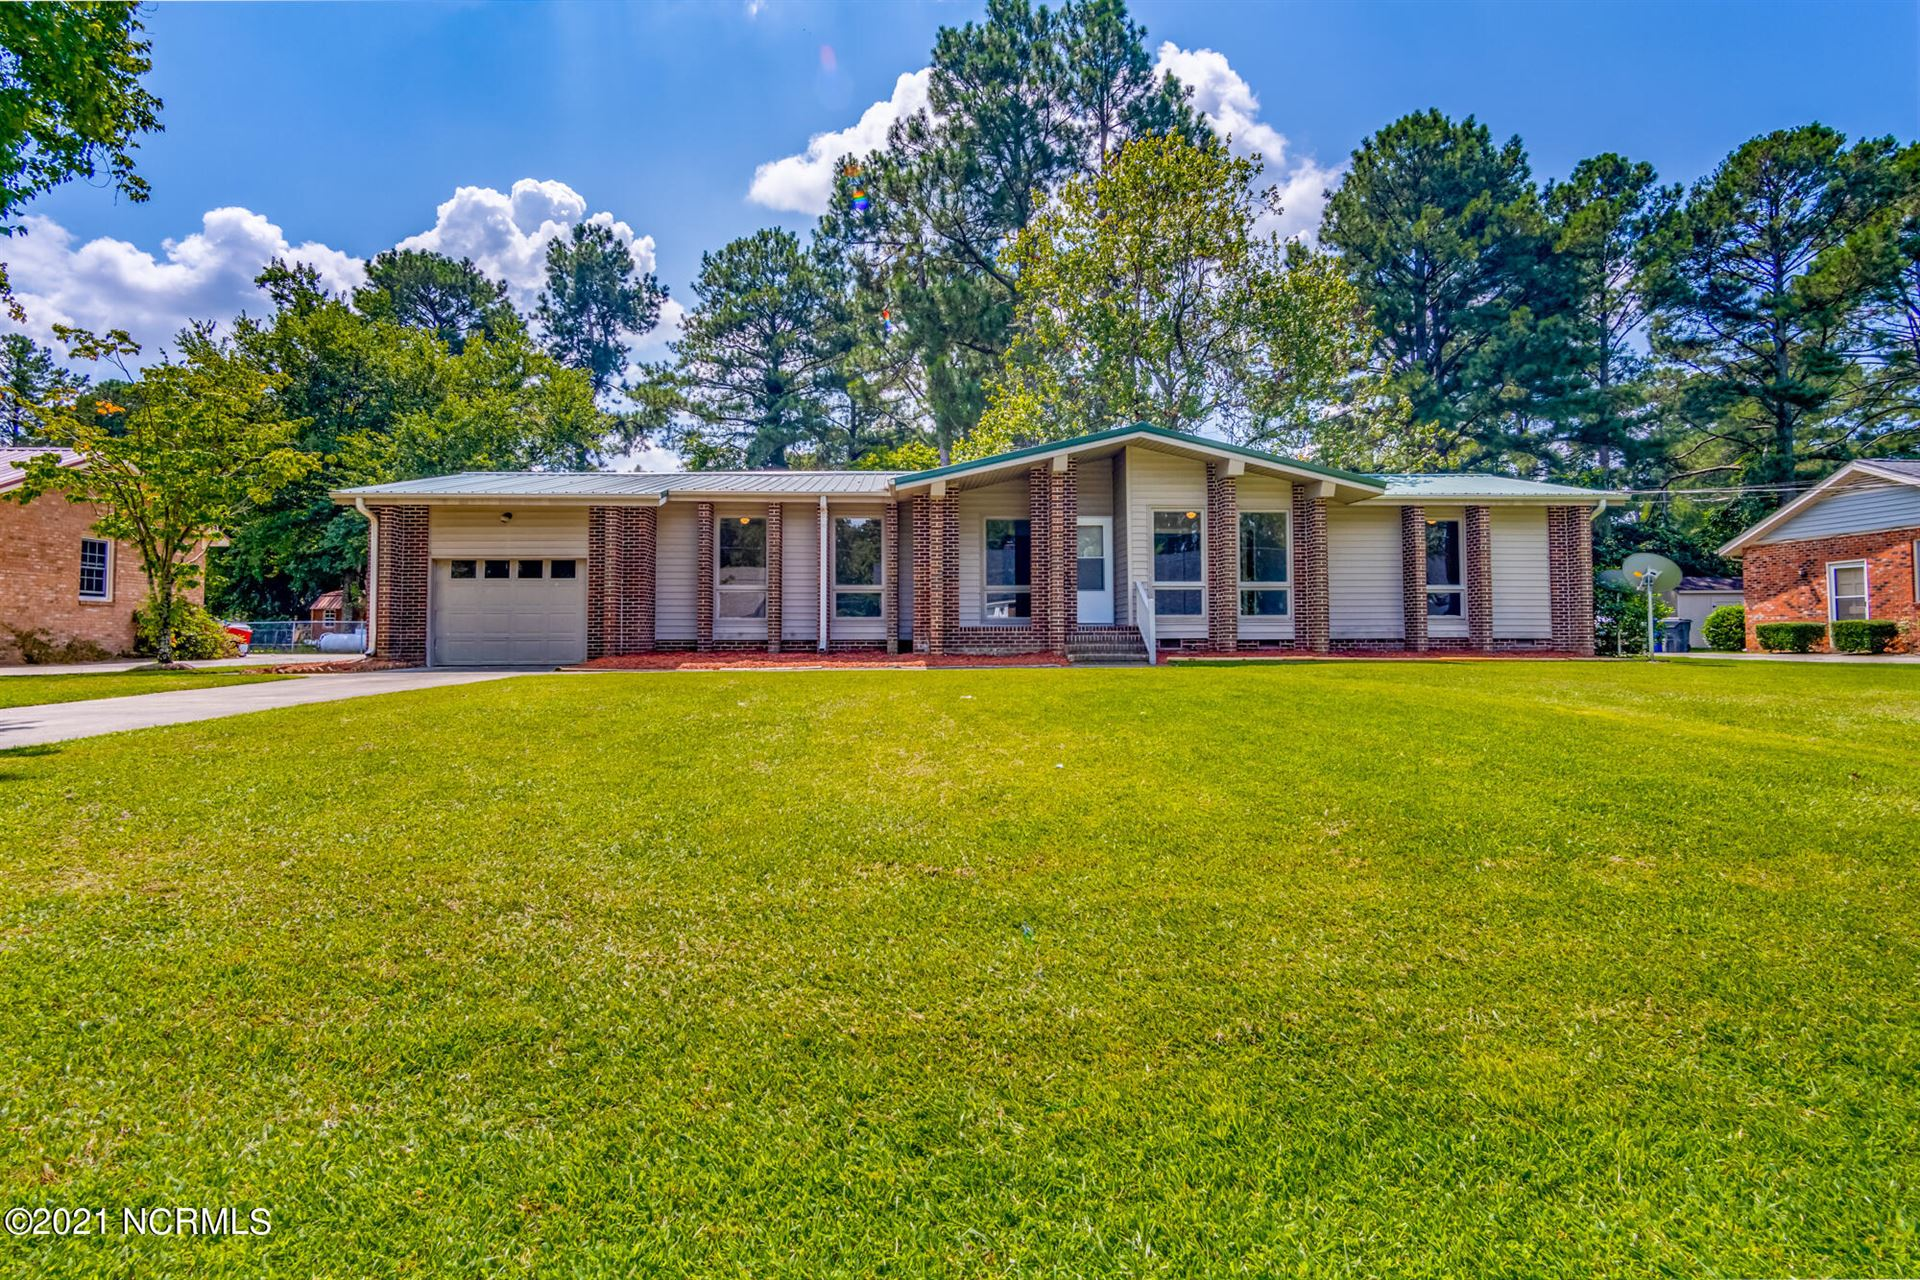 Photo of 2907 Hodges Road, Kinston, NC 28504 (MLS # 100289706)